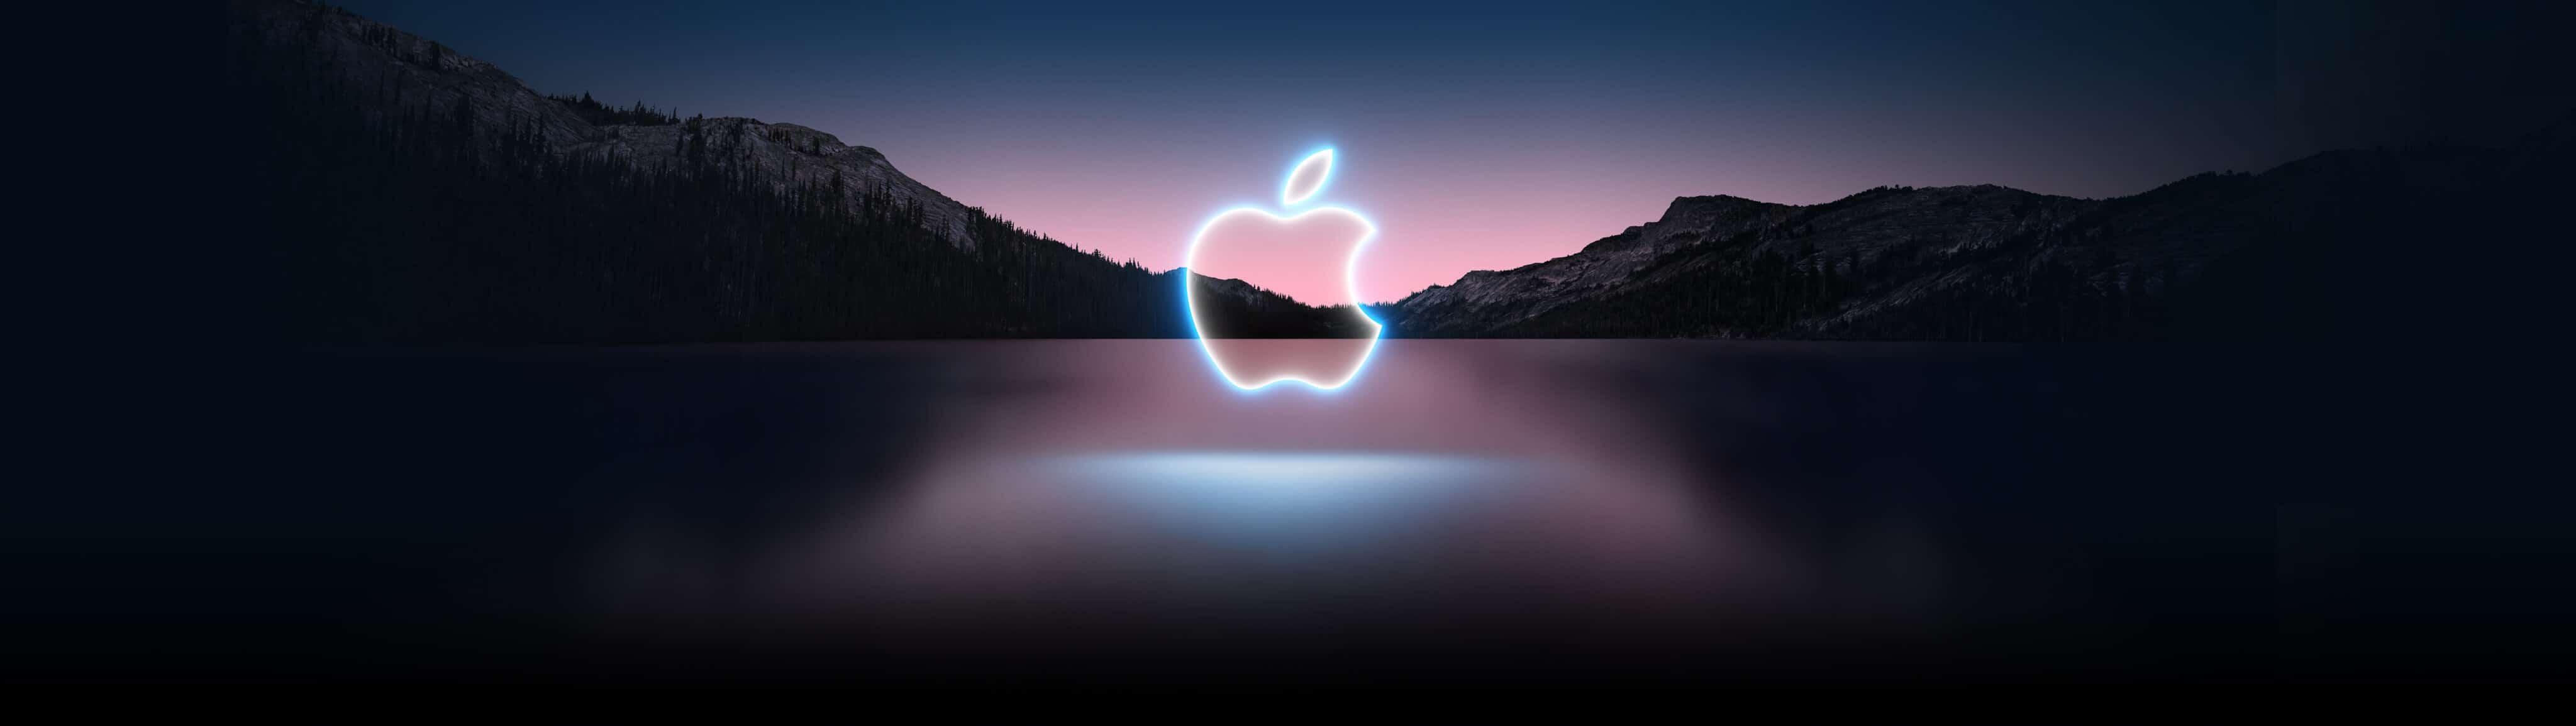 "Keynote ""California Streaming"" da Apple (maior)"